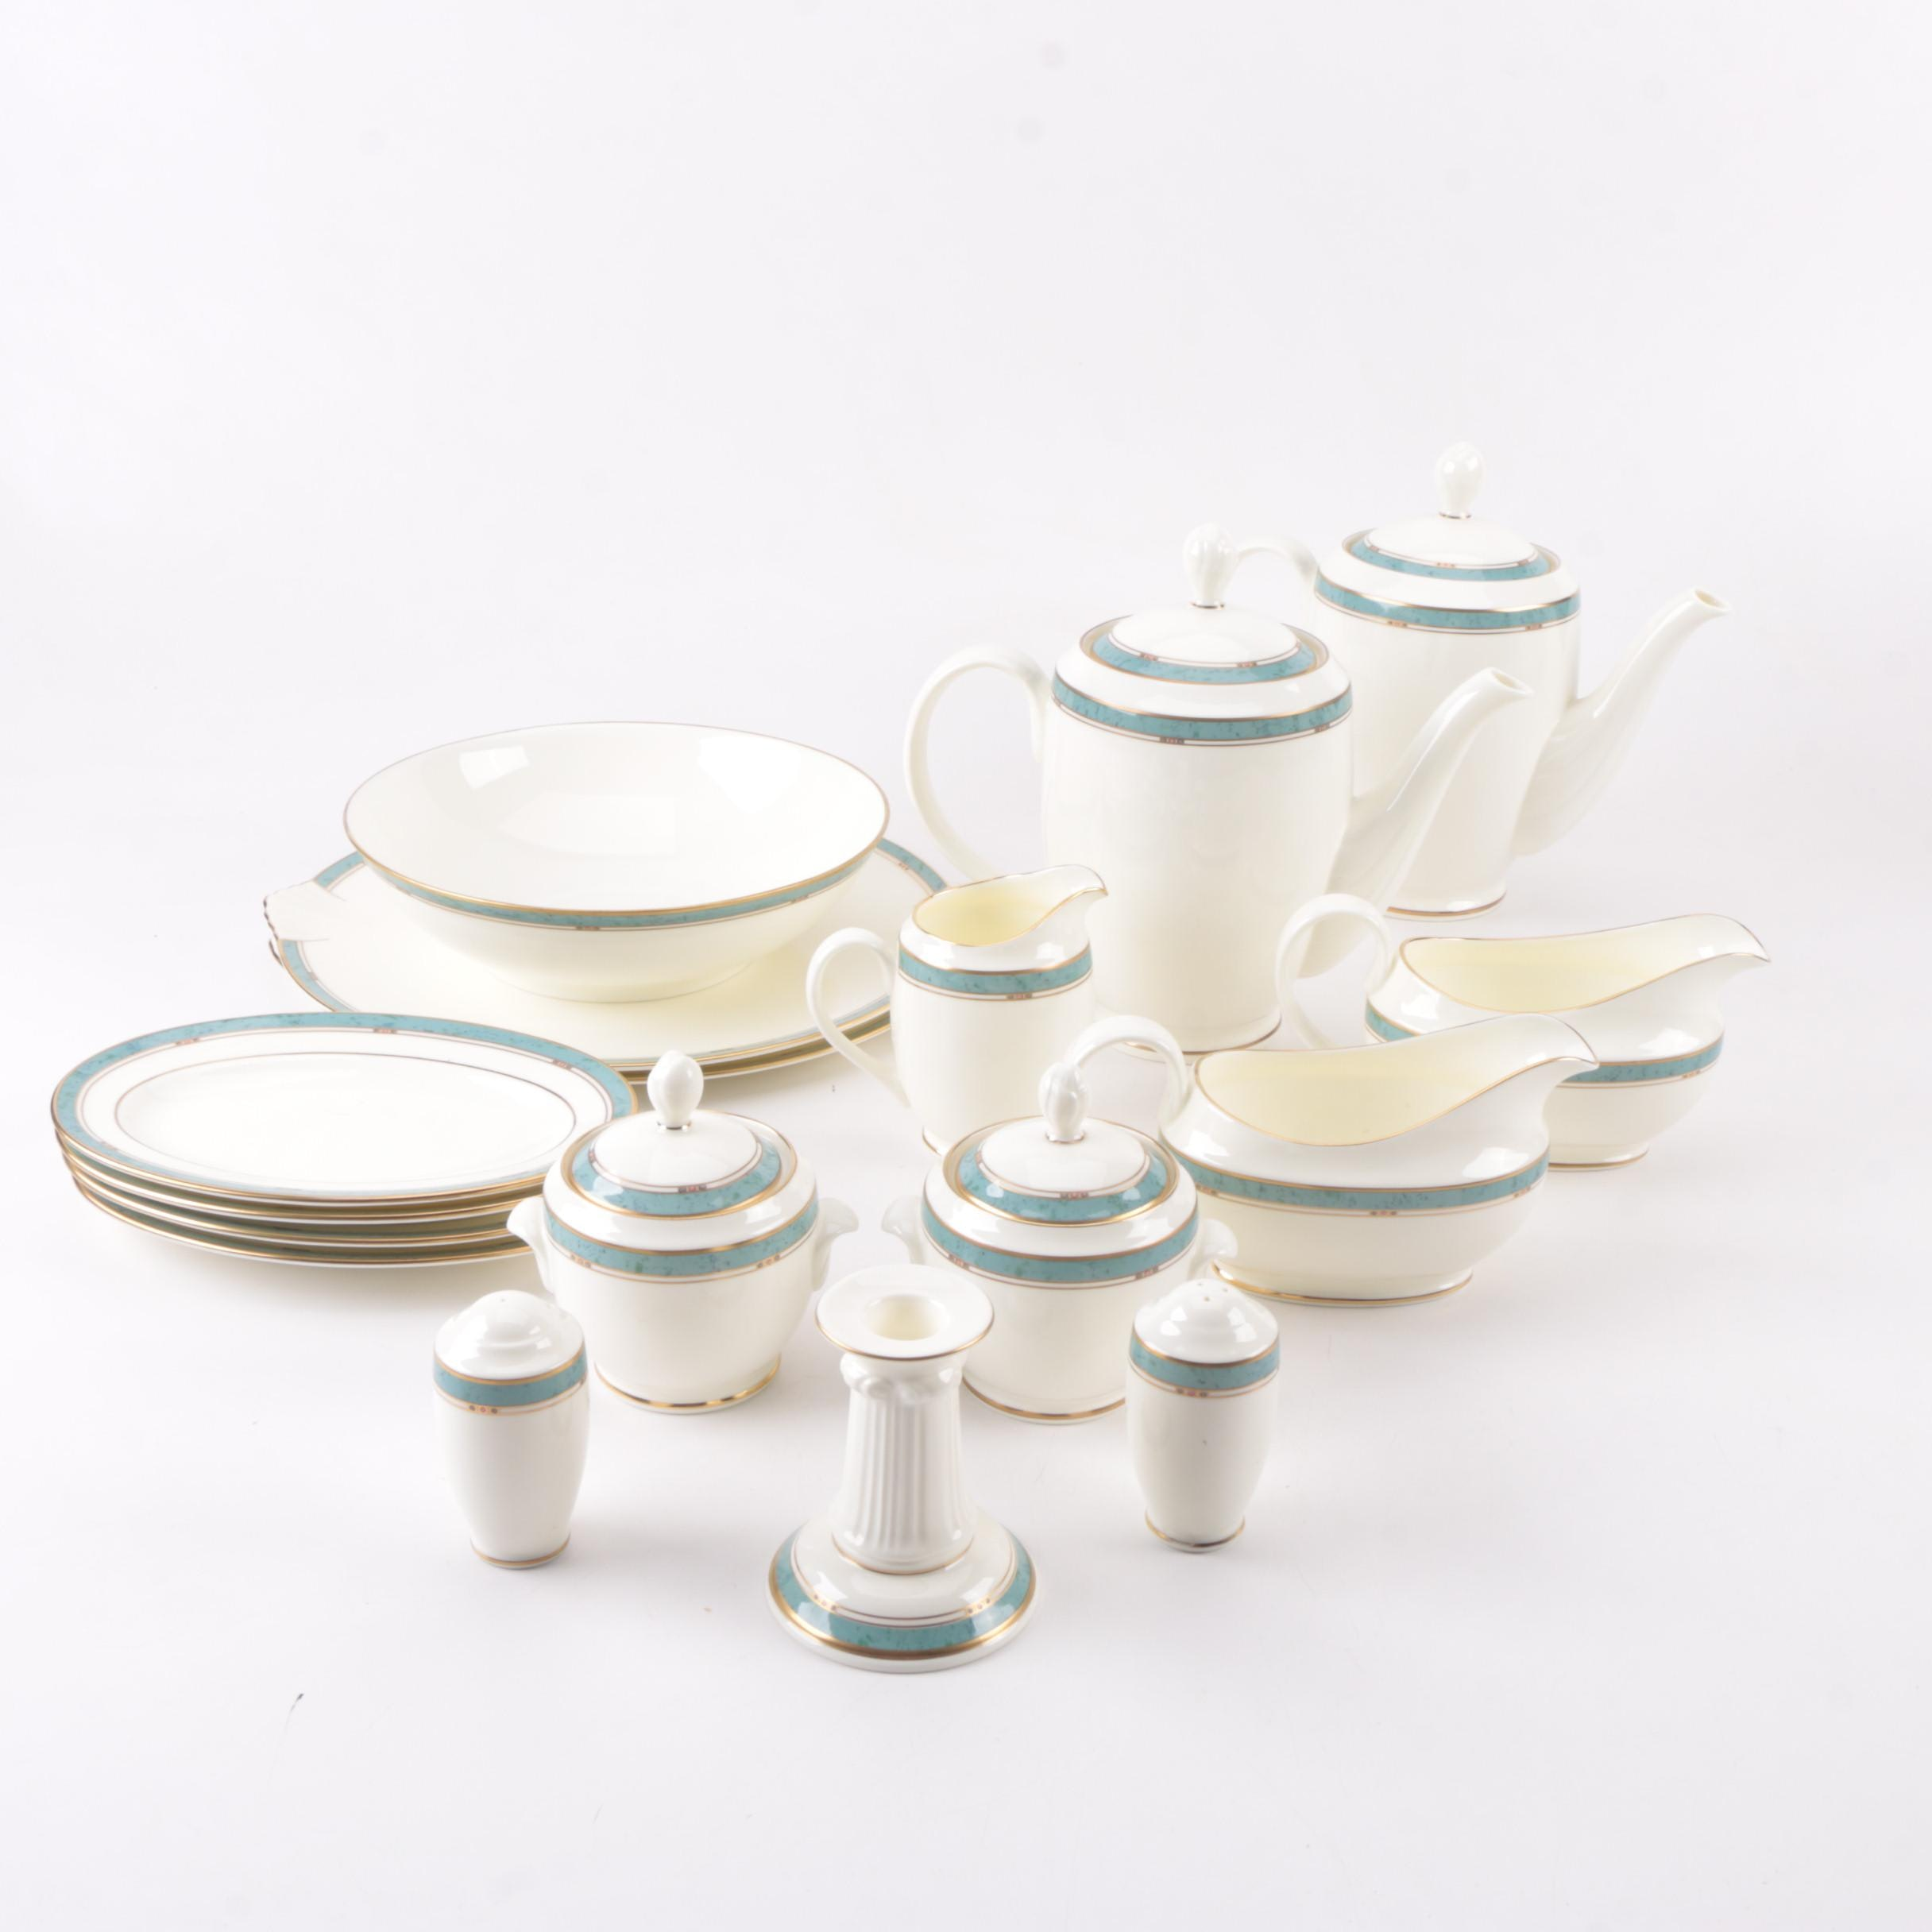 "Pfaltzgraff ""Patina"" Porcelain Serveware"